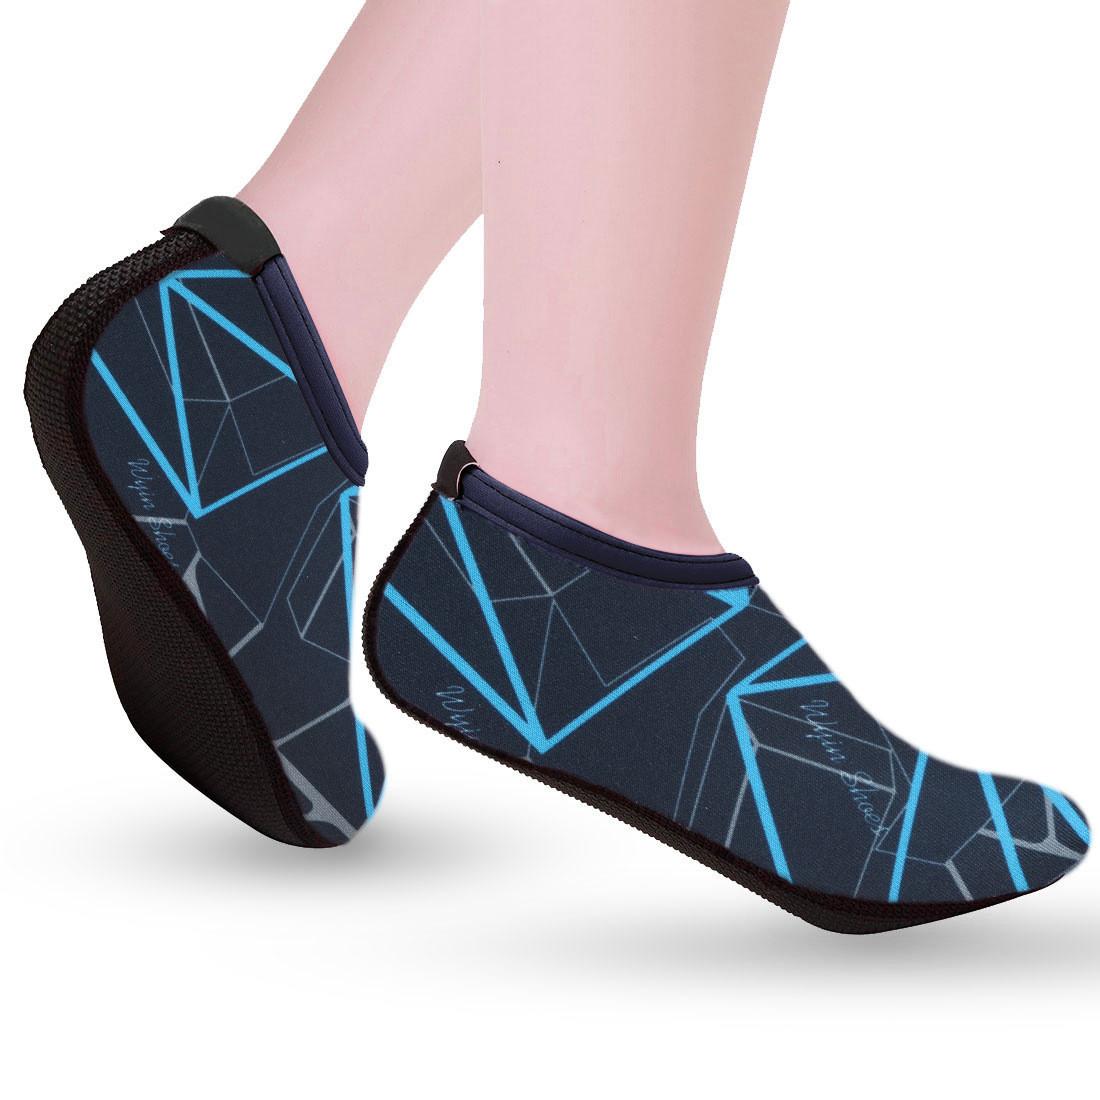 Аквашузы, обувь для дайвинга, плавания, пляжа Xing Blue, синий